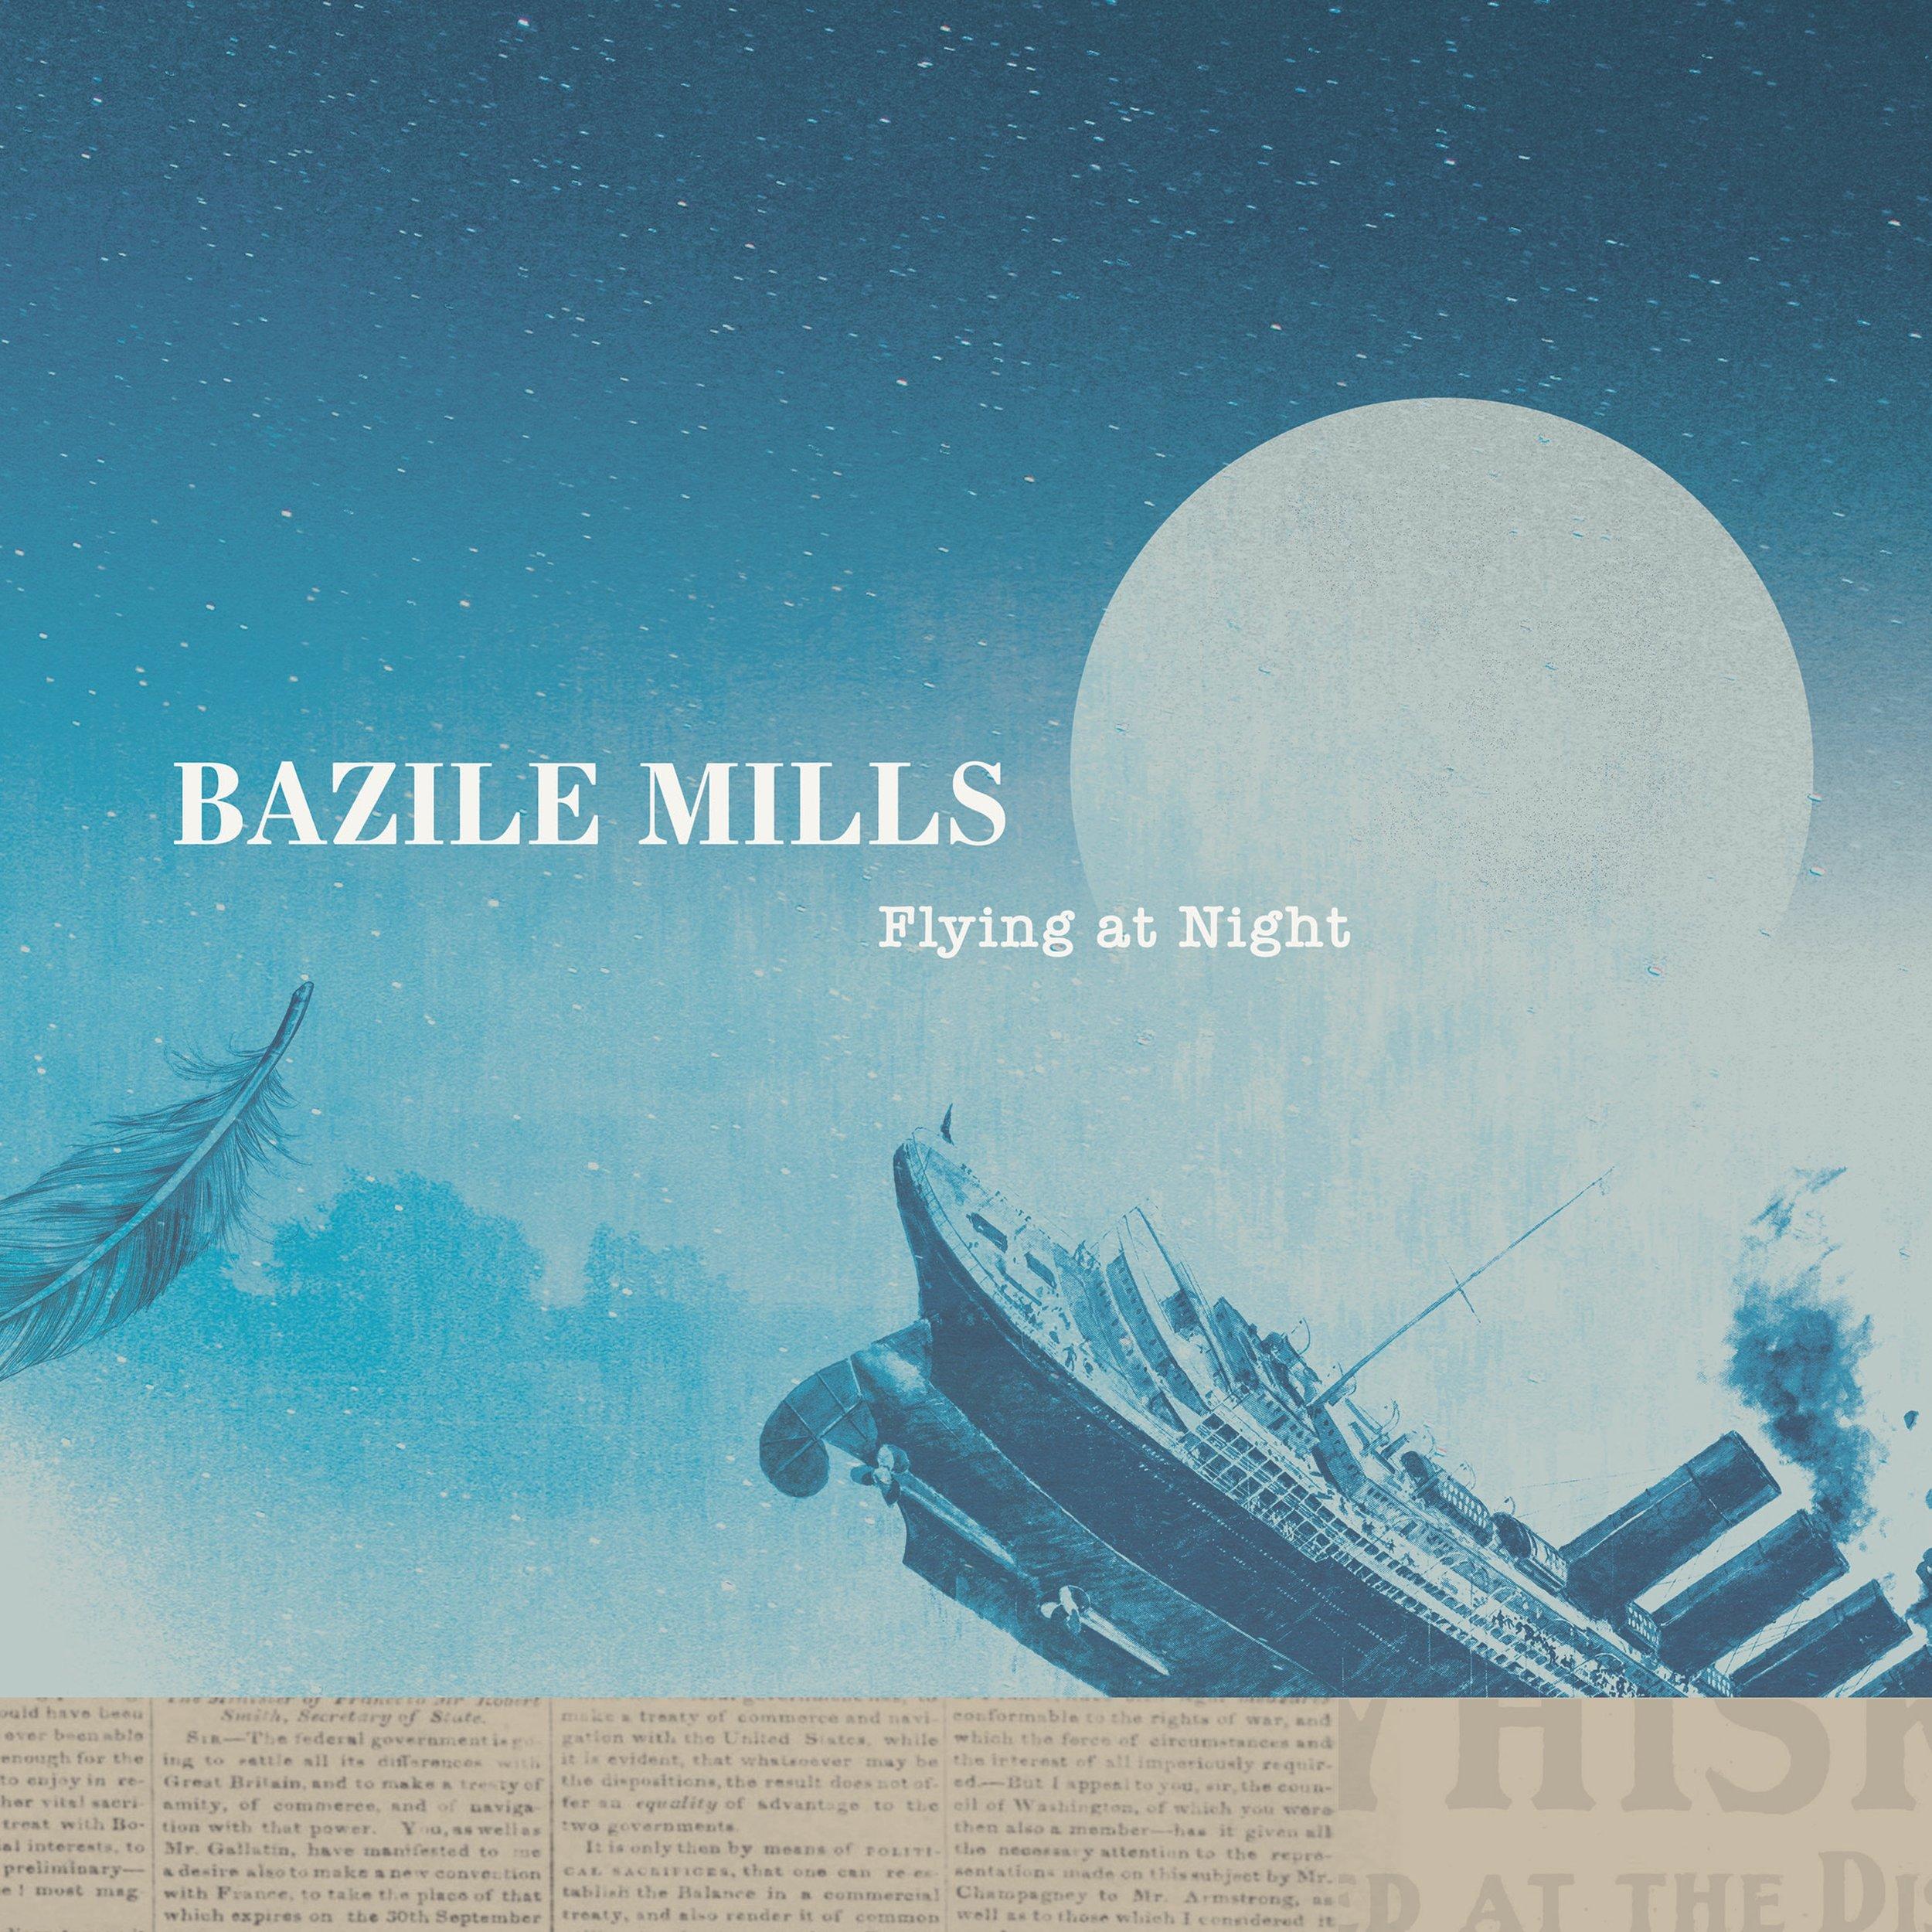 BZM-flying-at-night.jpg